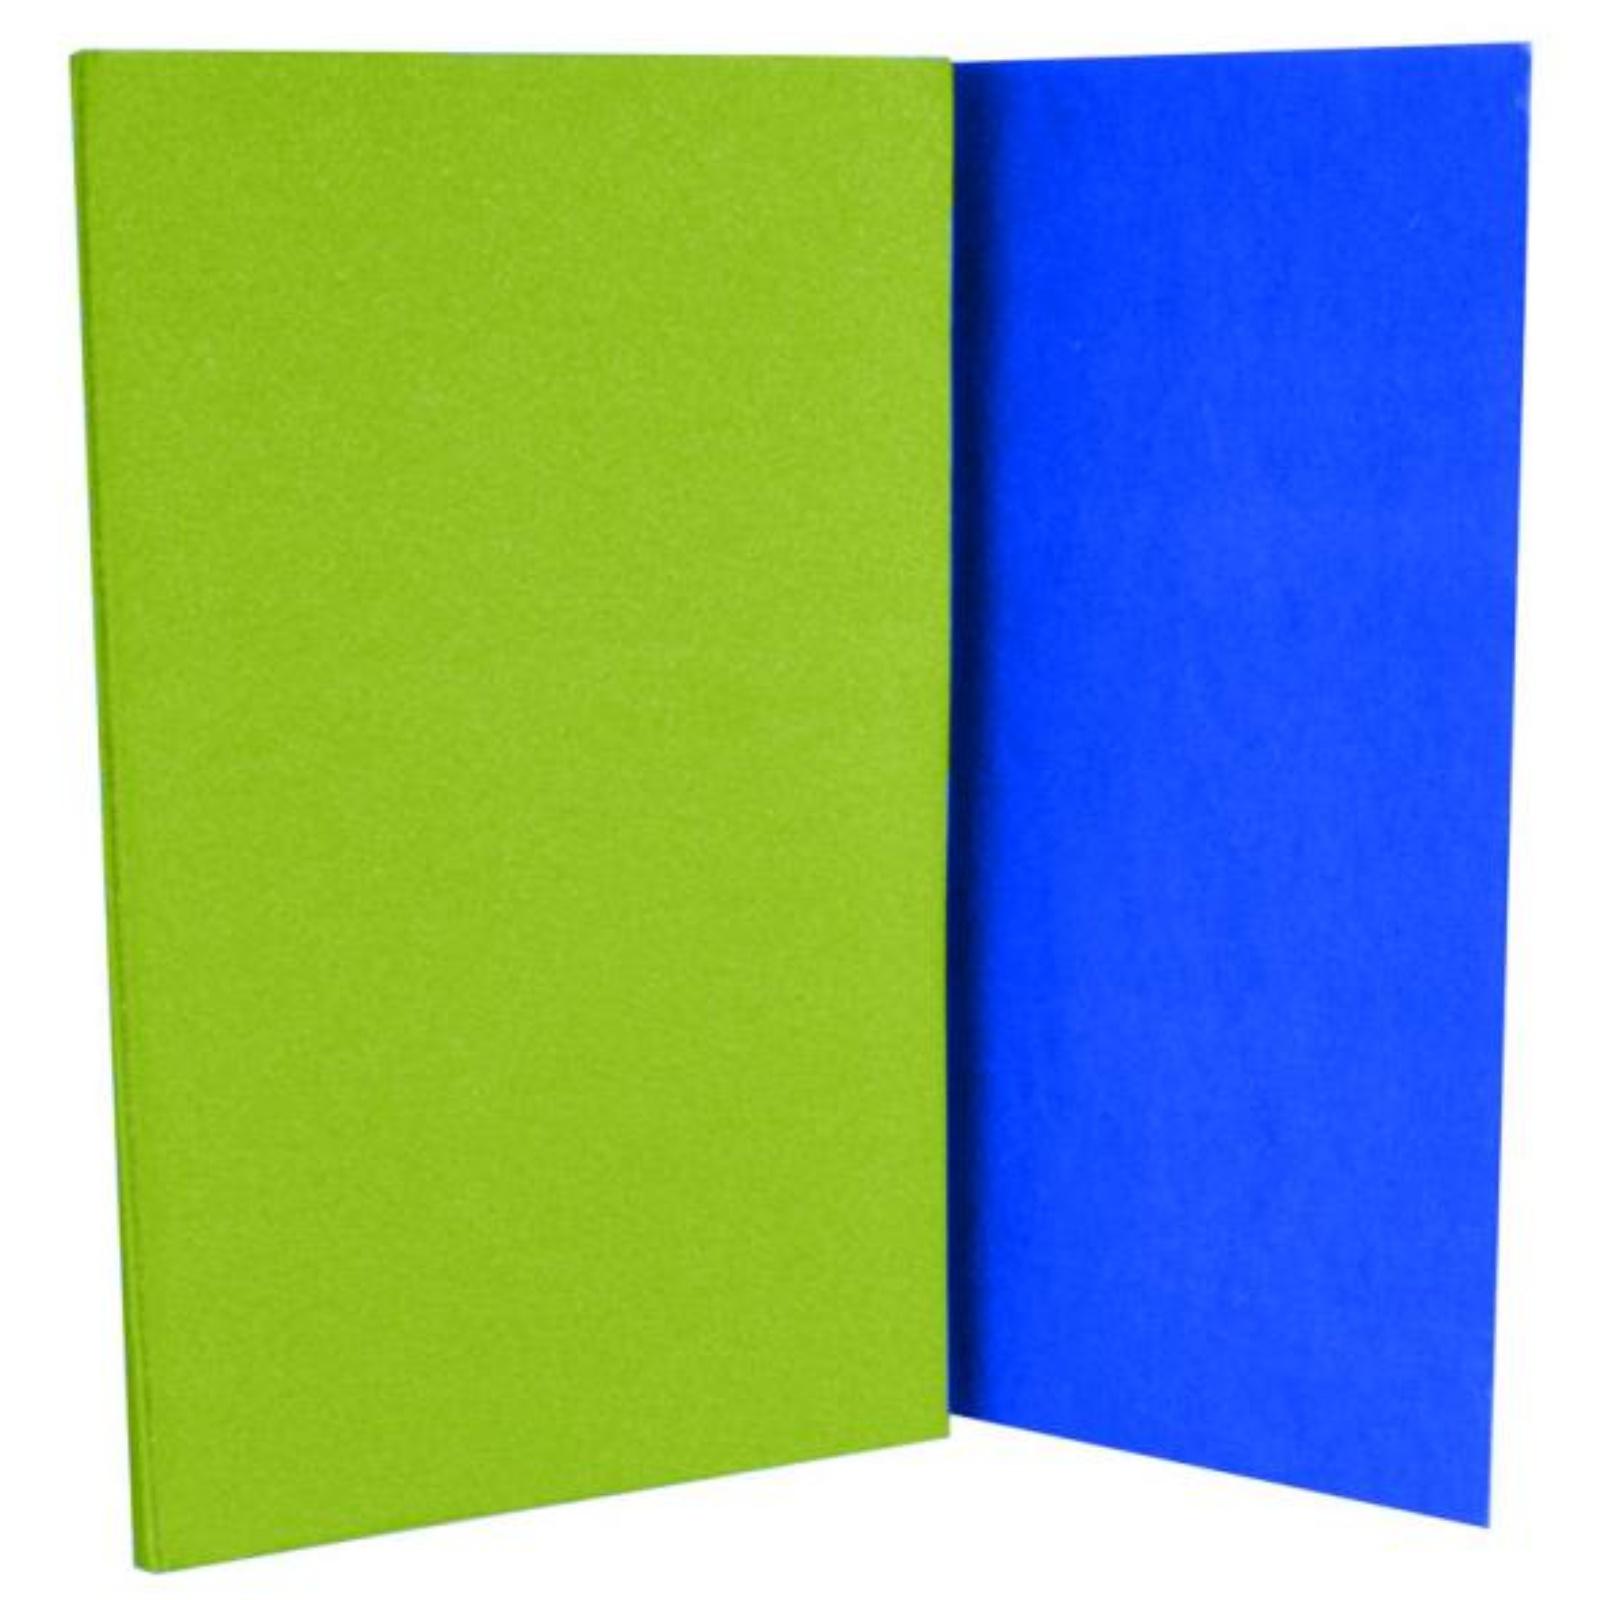 Karimatka skladacia s fóliou - zelen-modrá